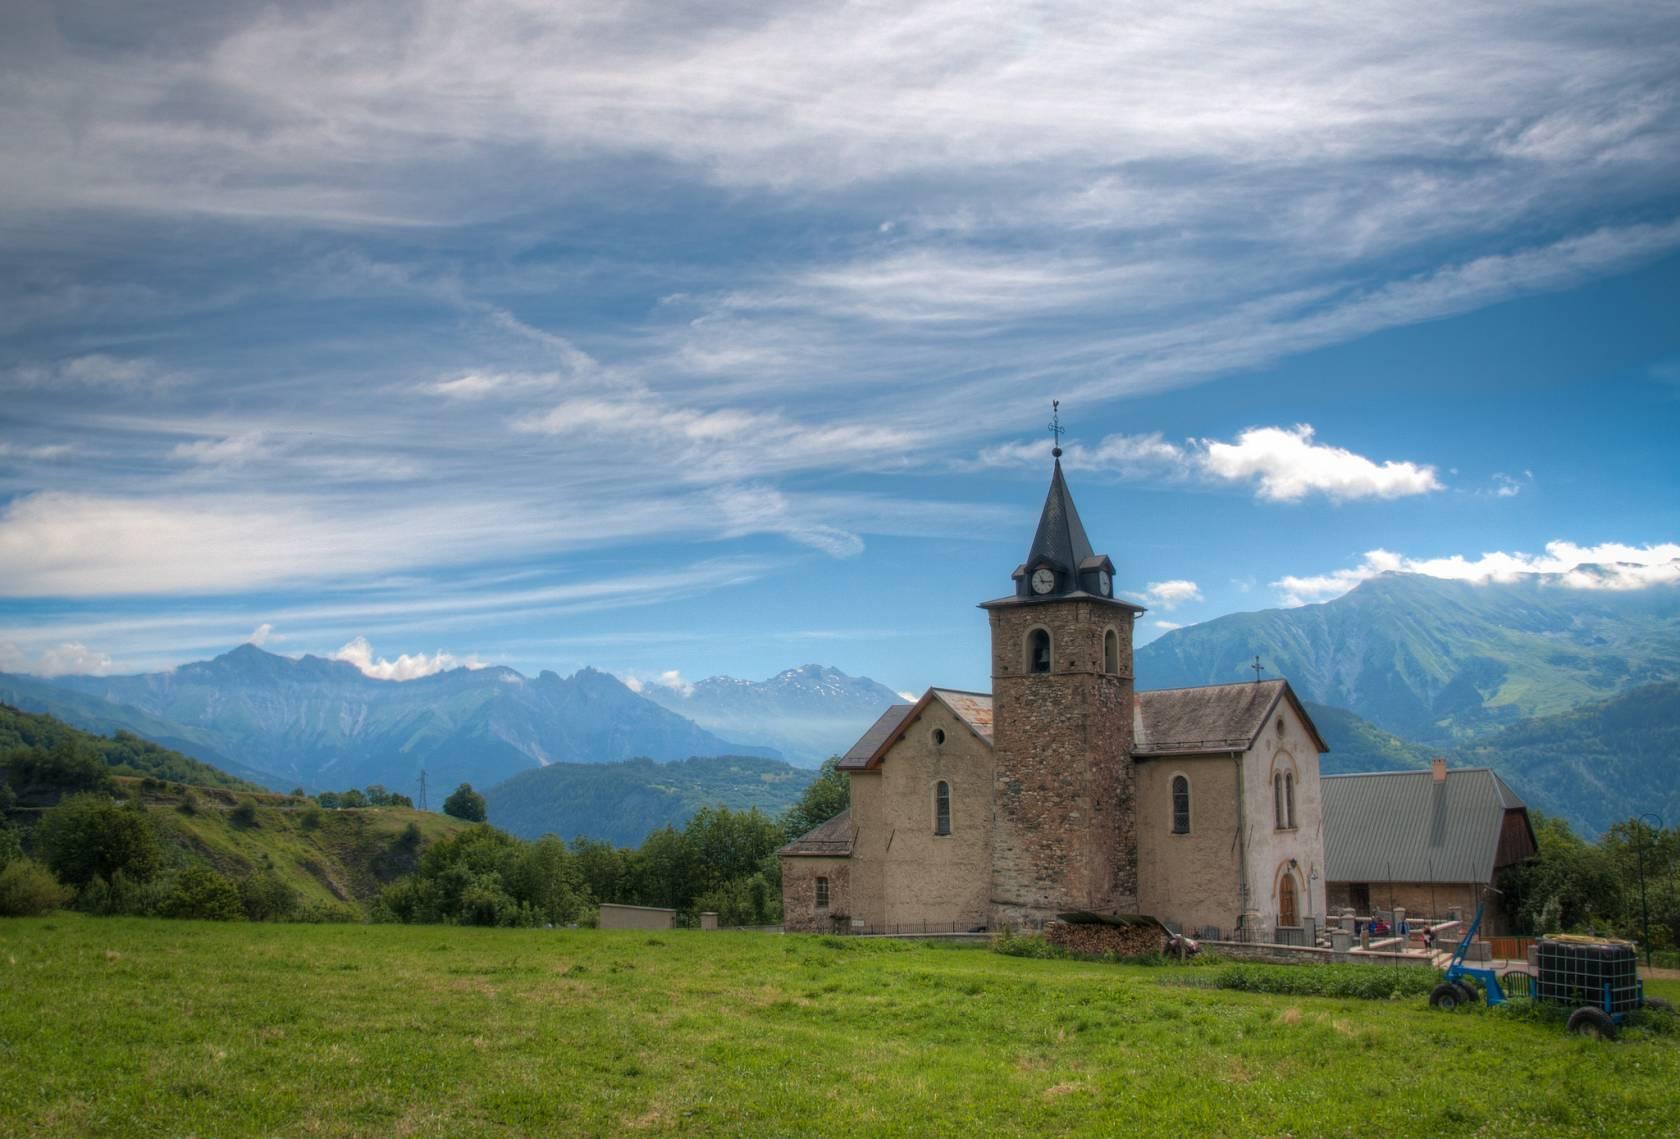 Saint Jean de Maurienne